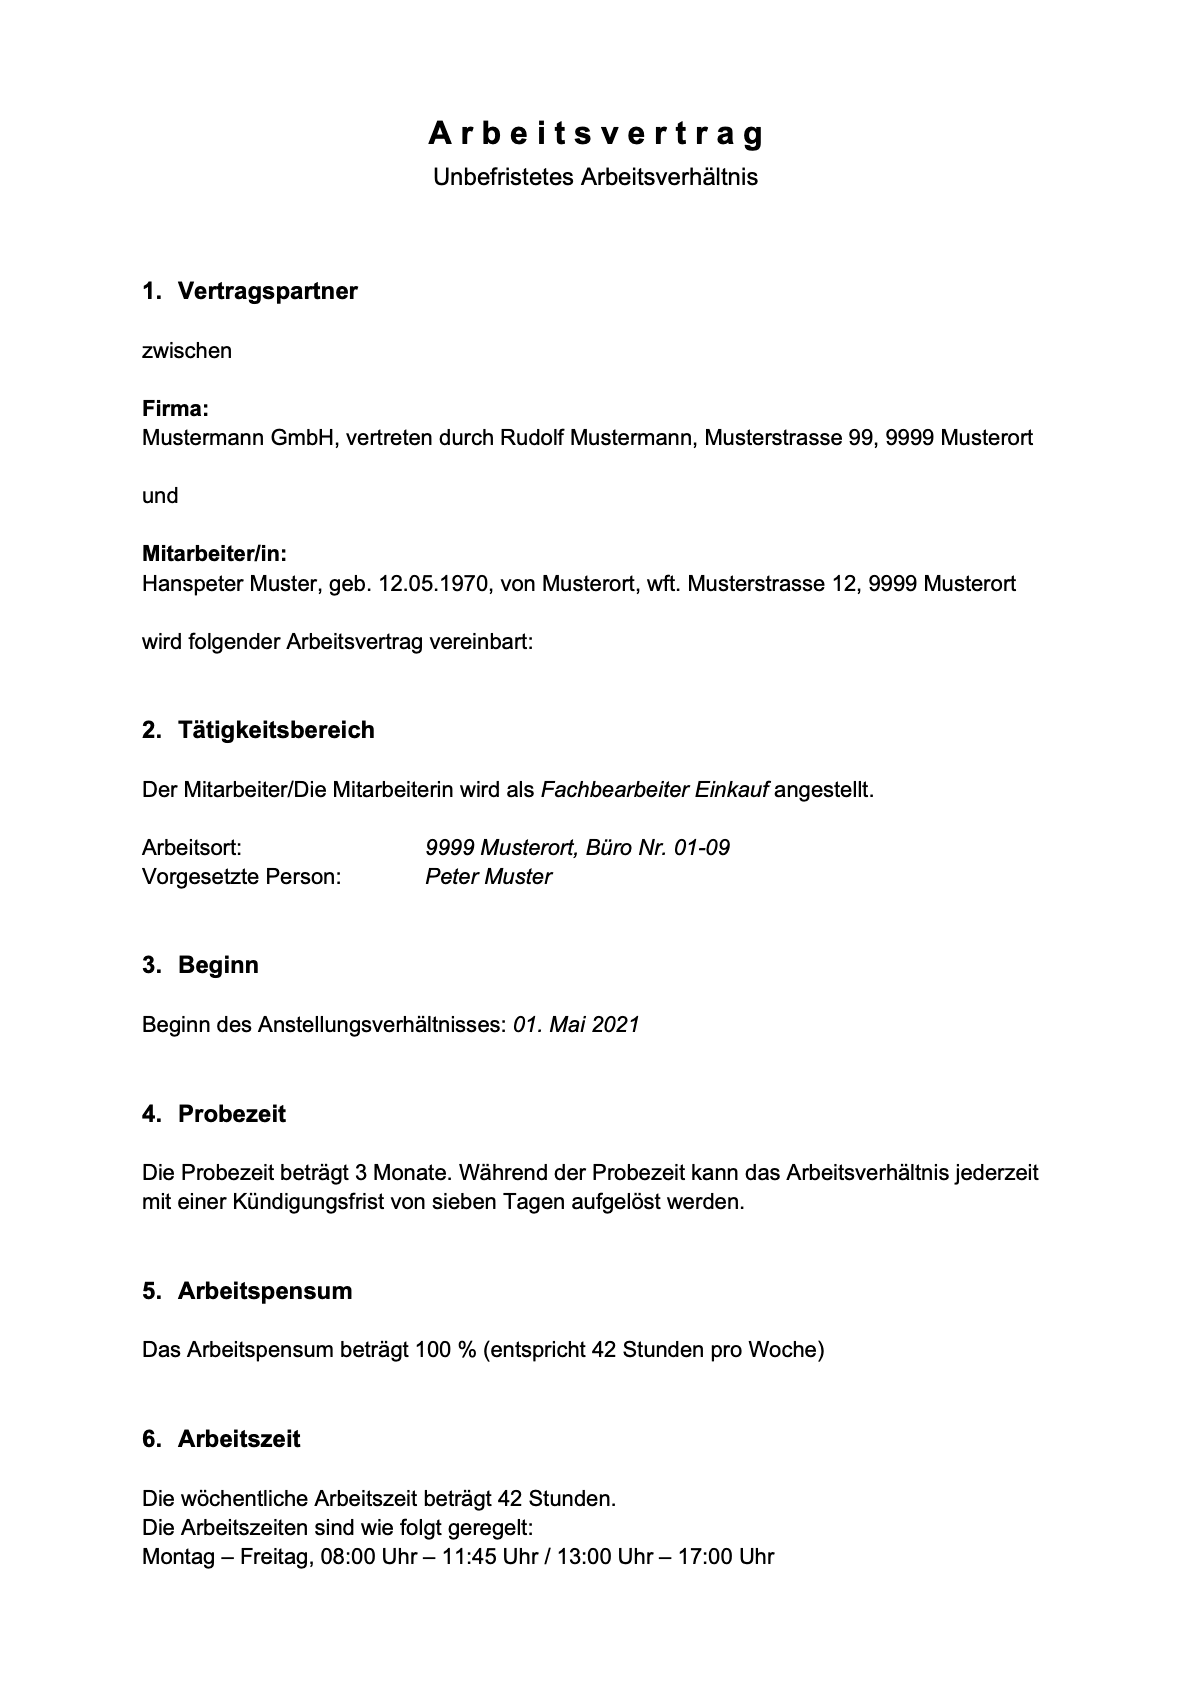 Arbeitsvertrag Vorlage Download Freeware De